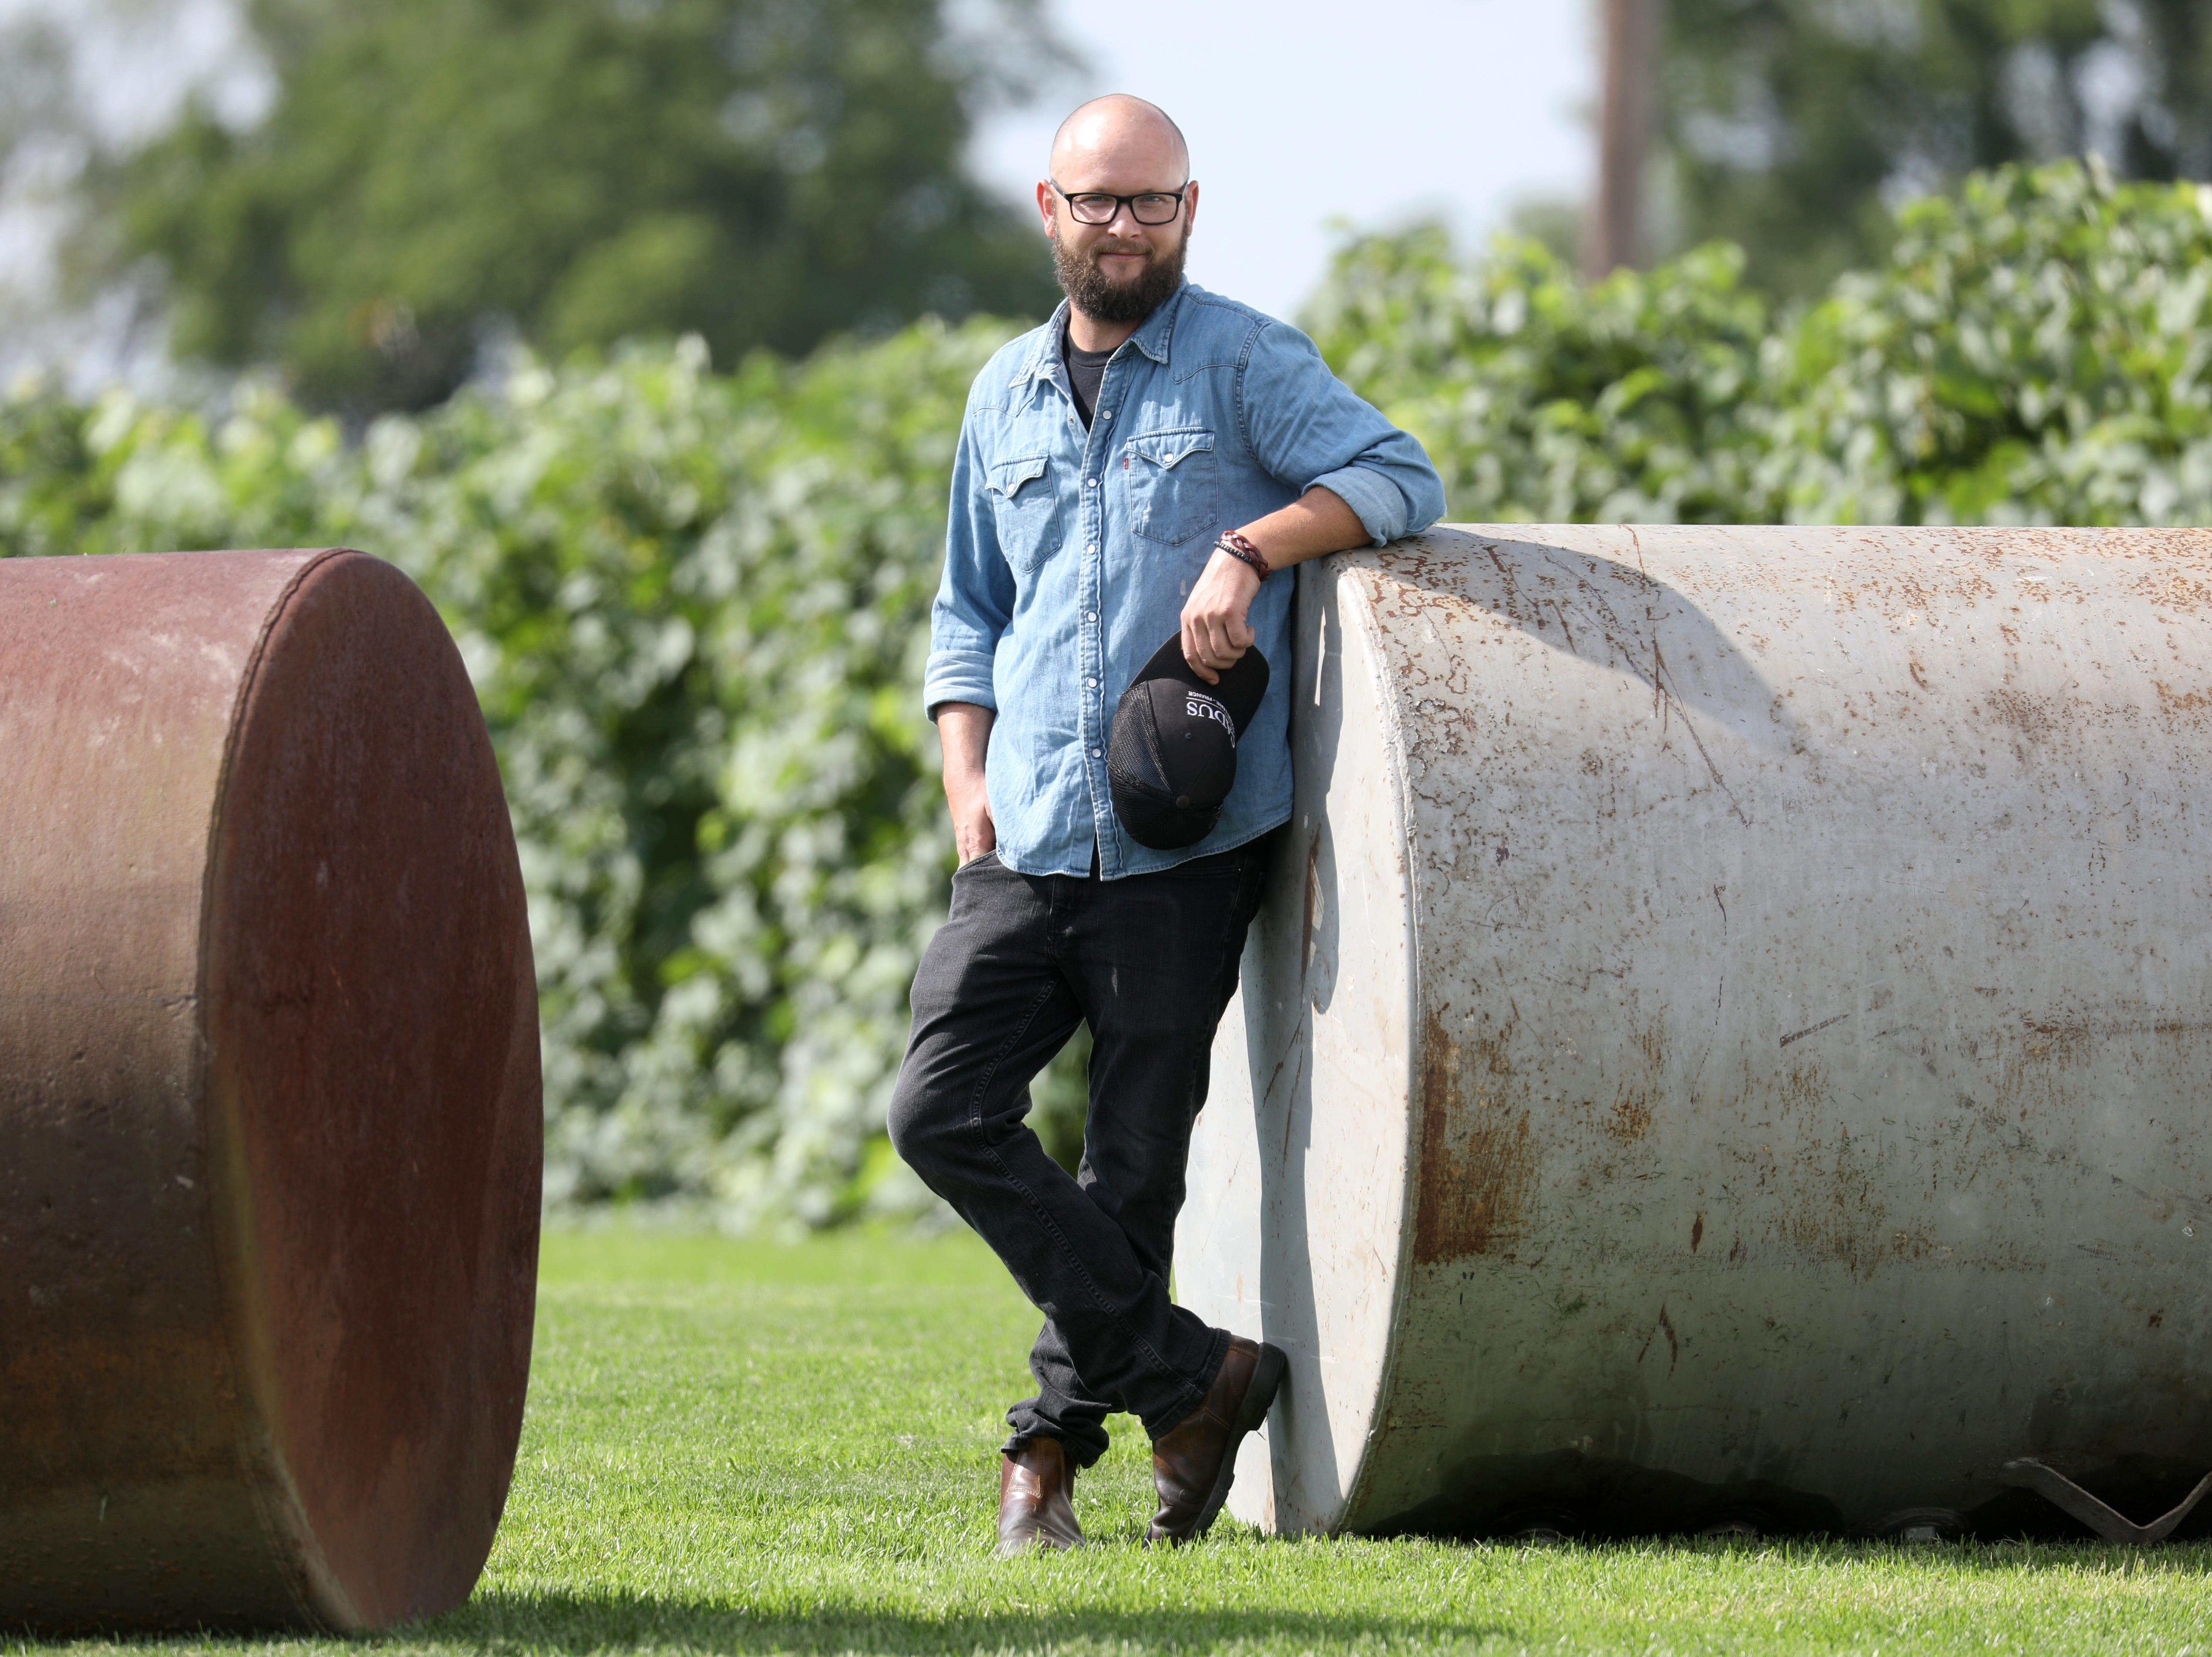 Nathan Kendall, who owns Nathan K. Wines, pauses at Tuller Vineyards on Seneca Lake.